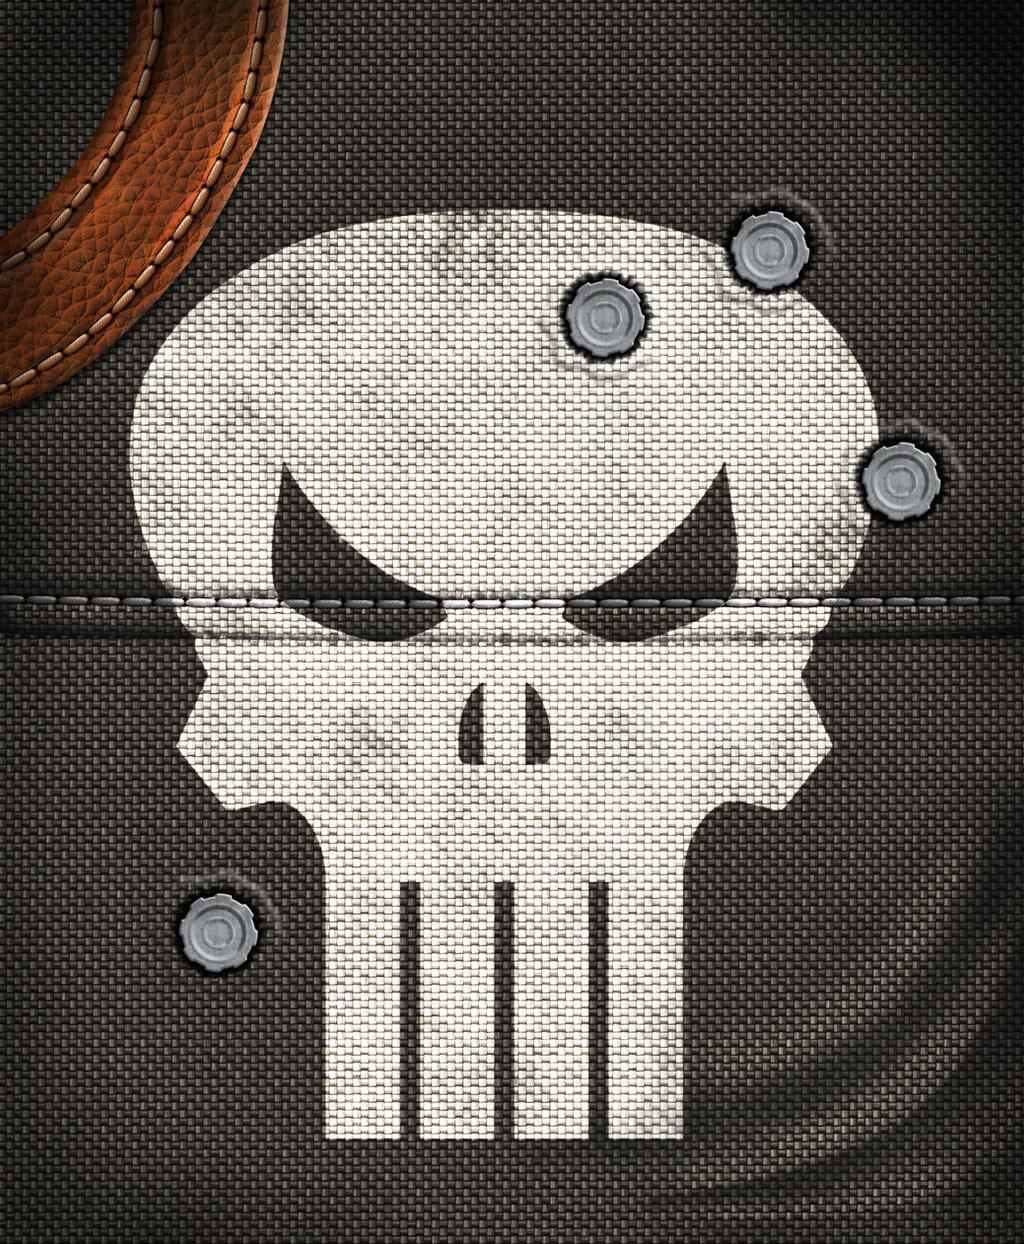 The-Punisher-logo by Dom-Graphcom